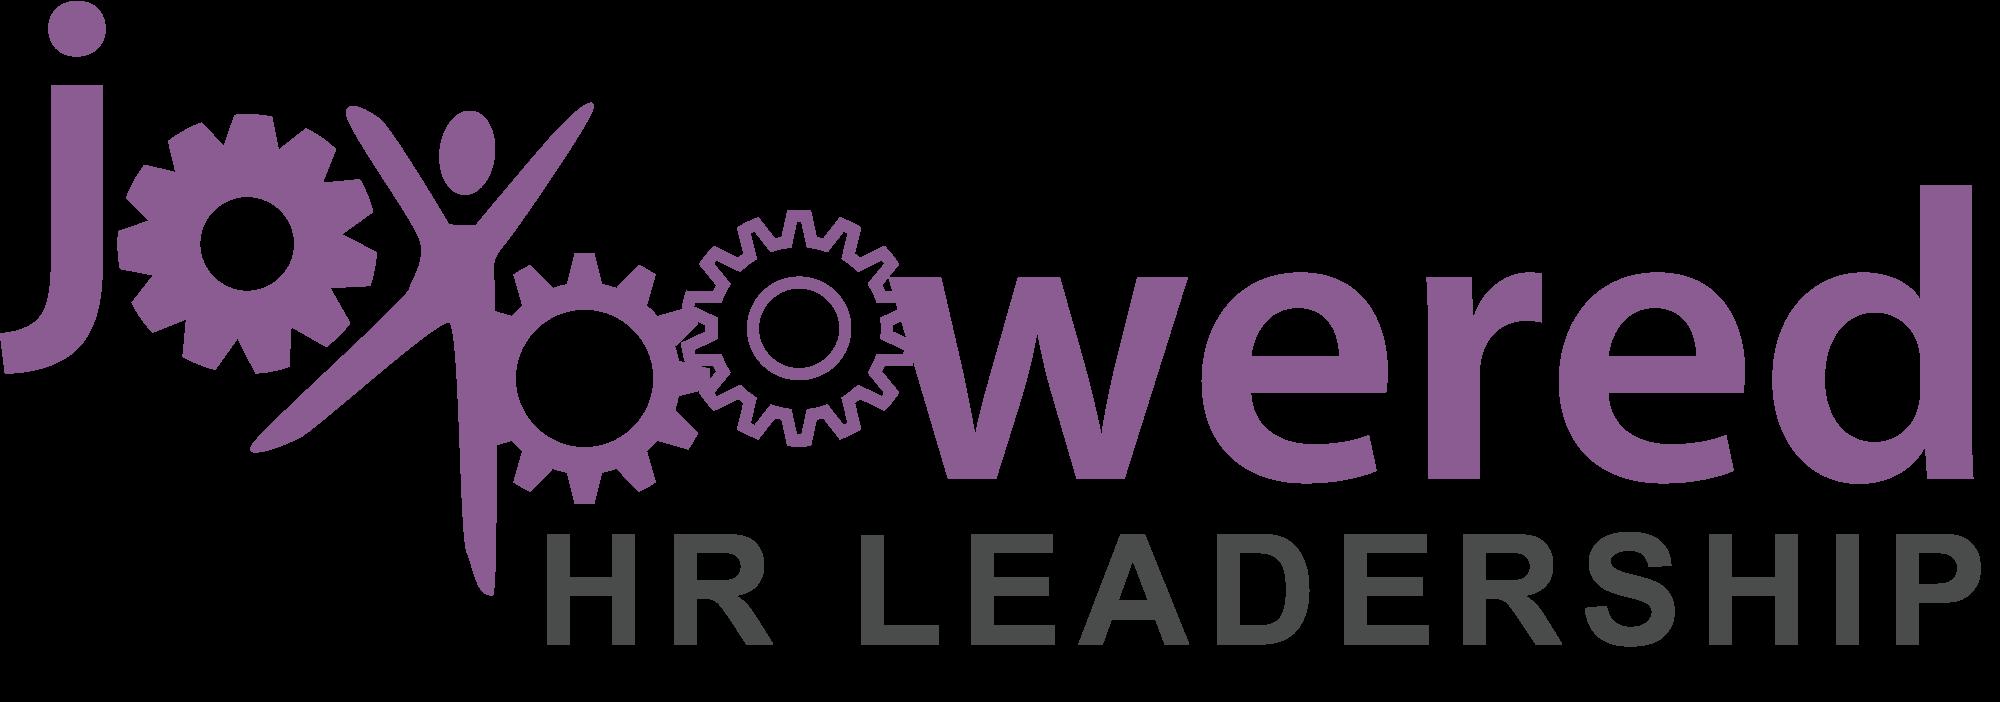 JoyPowered-HR-Leadership-Logo-Large